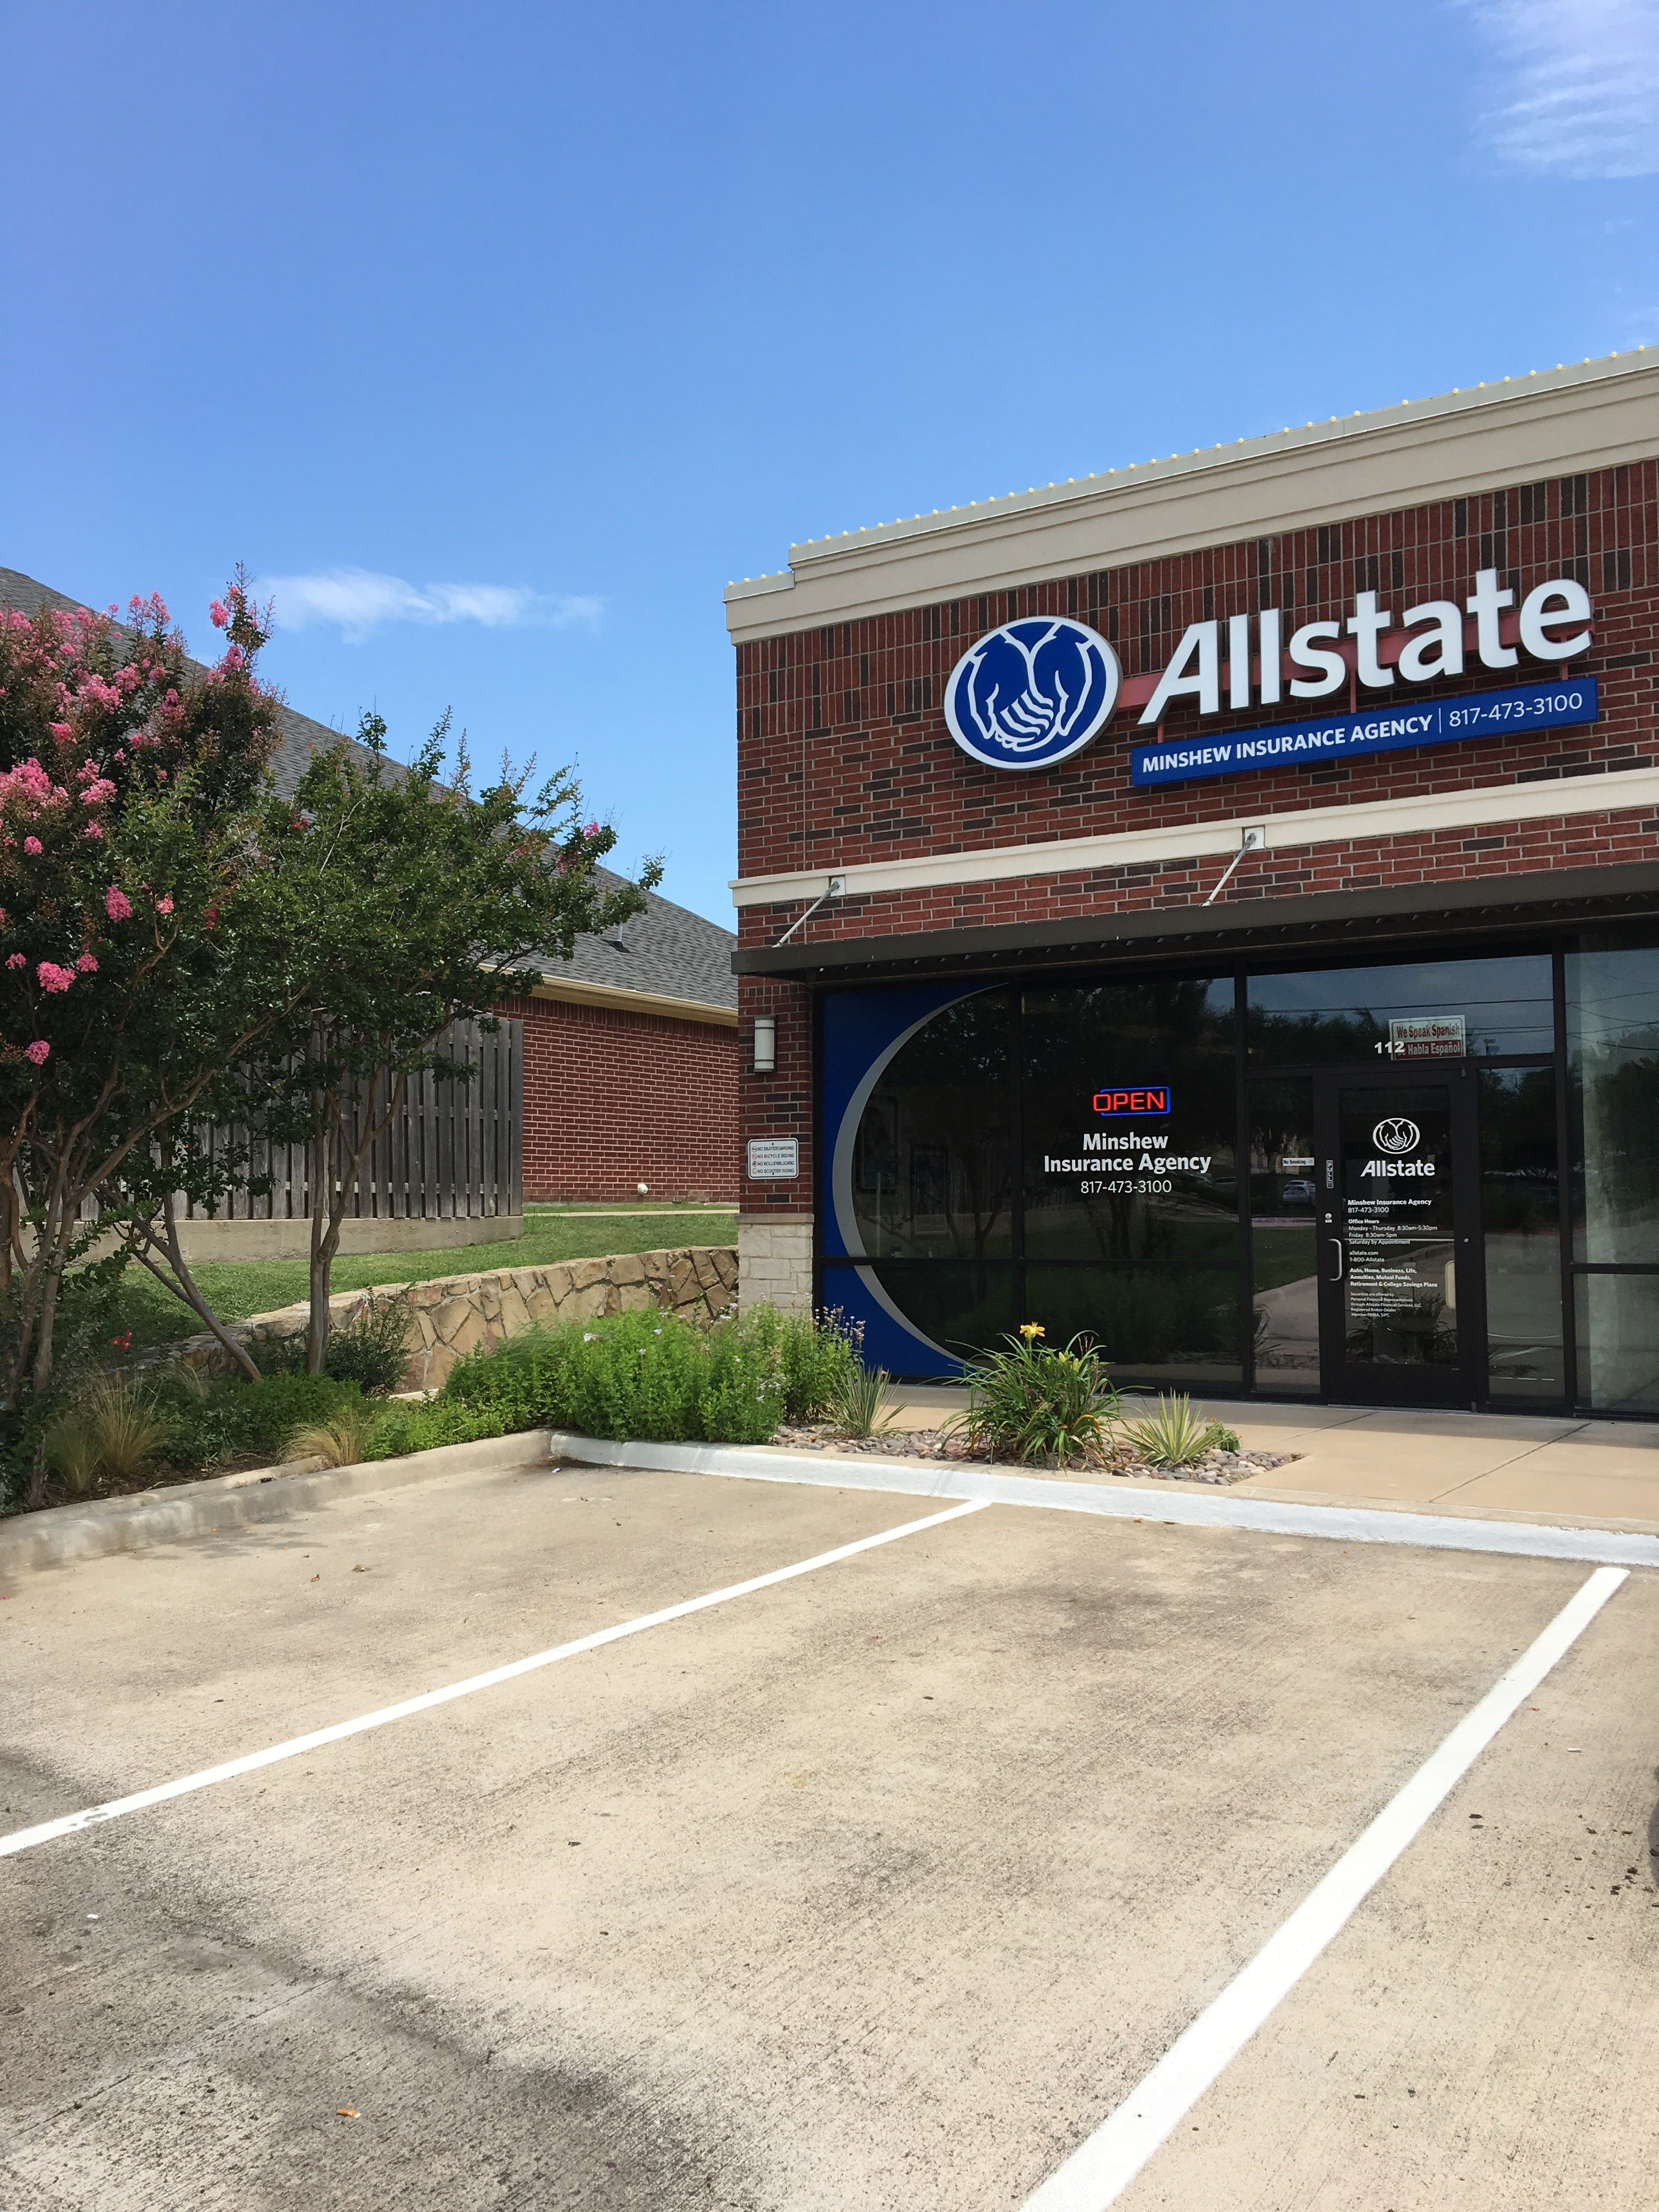 James Minshew: Allstate Insurance image 0